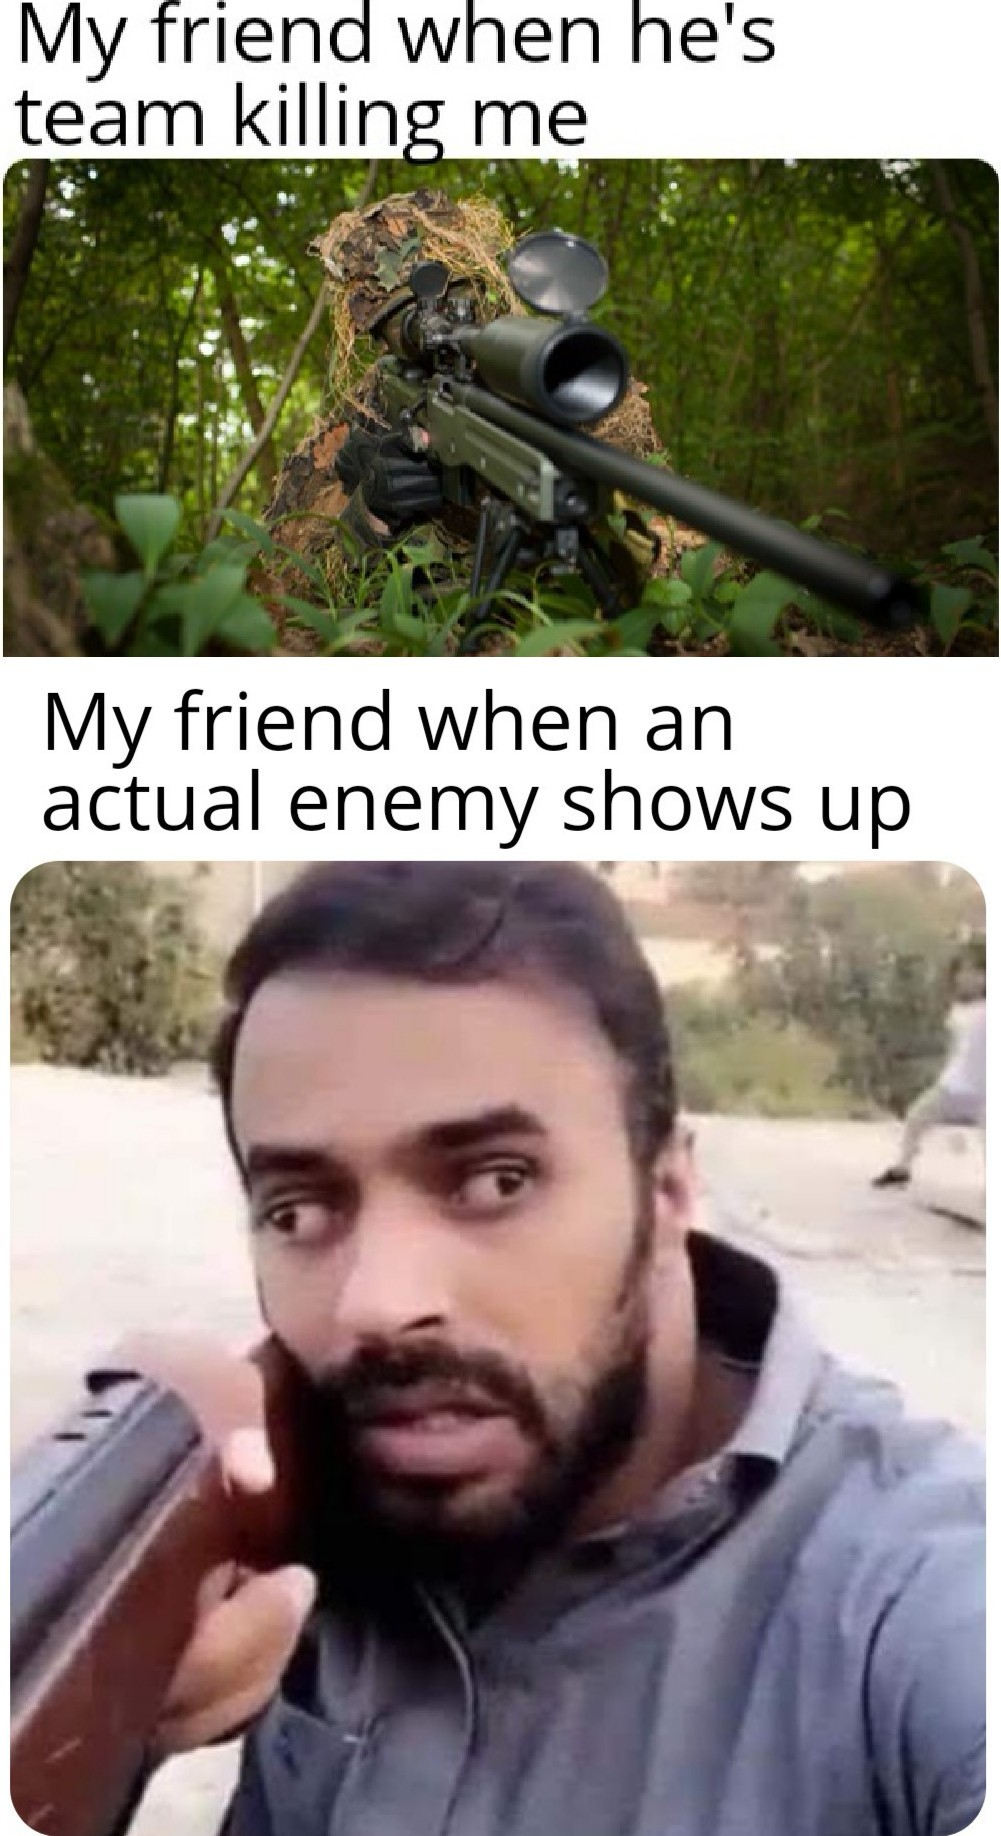 Rdr2 online is boring as shit - meme